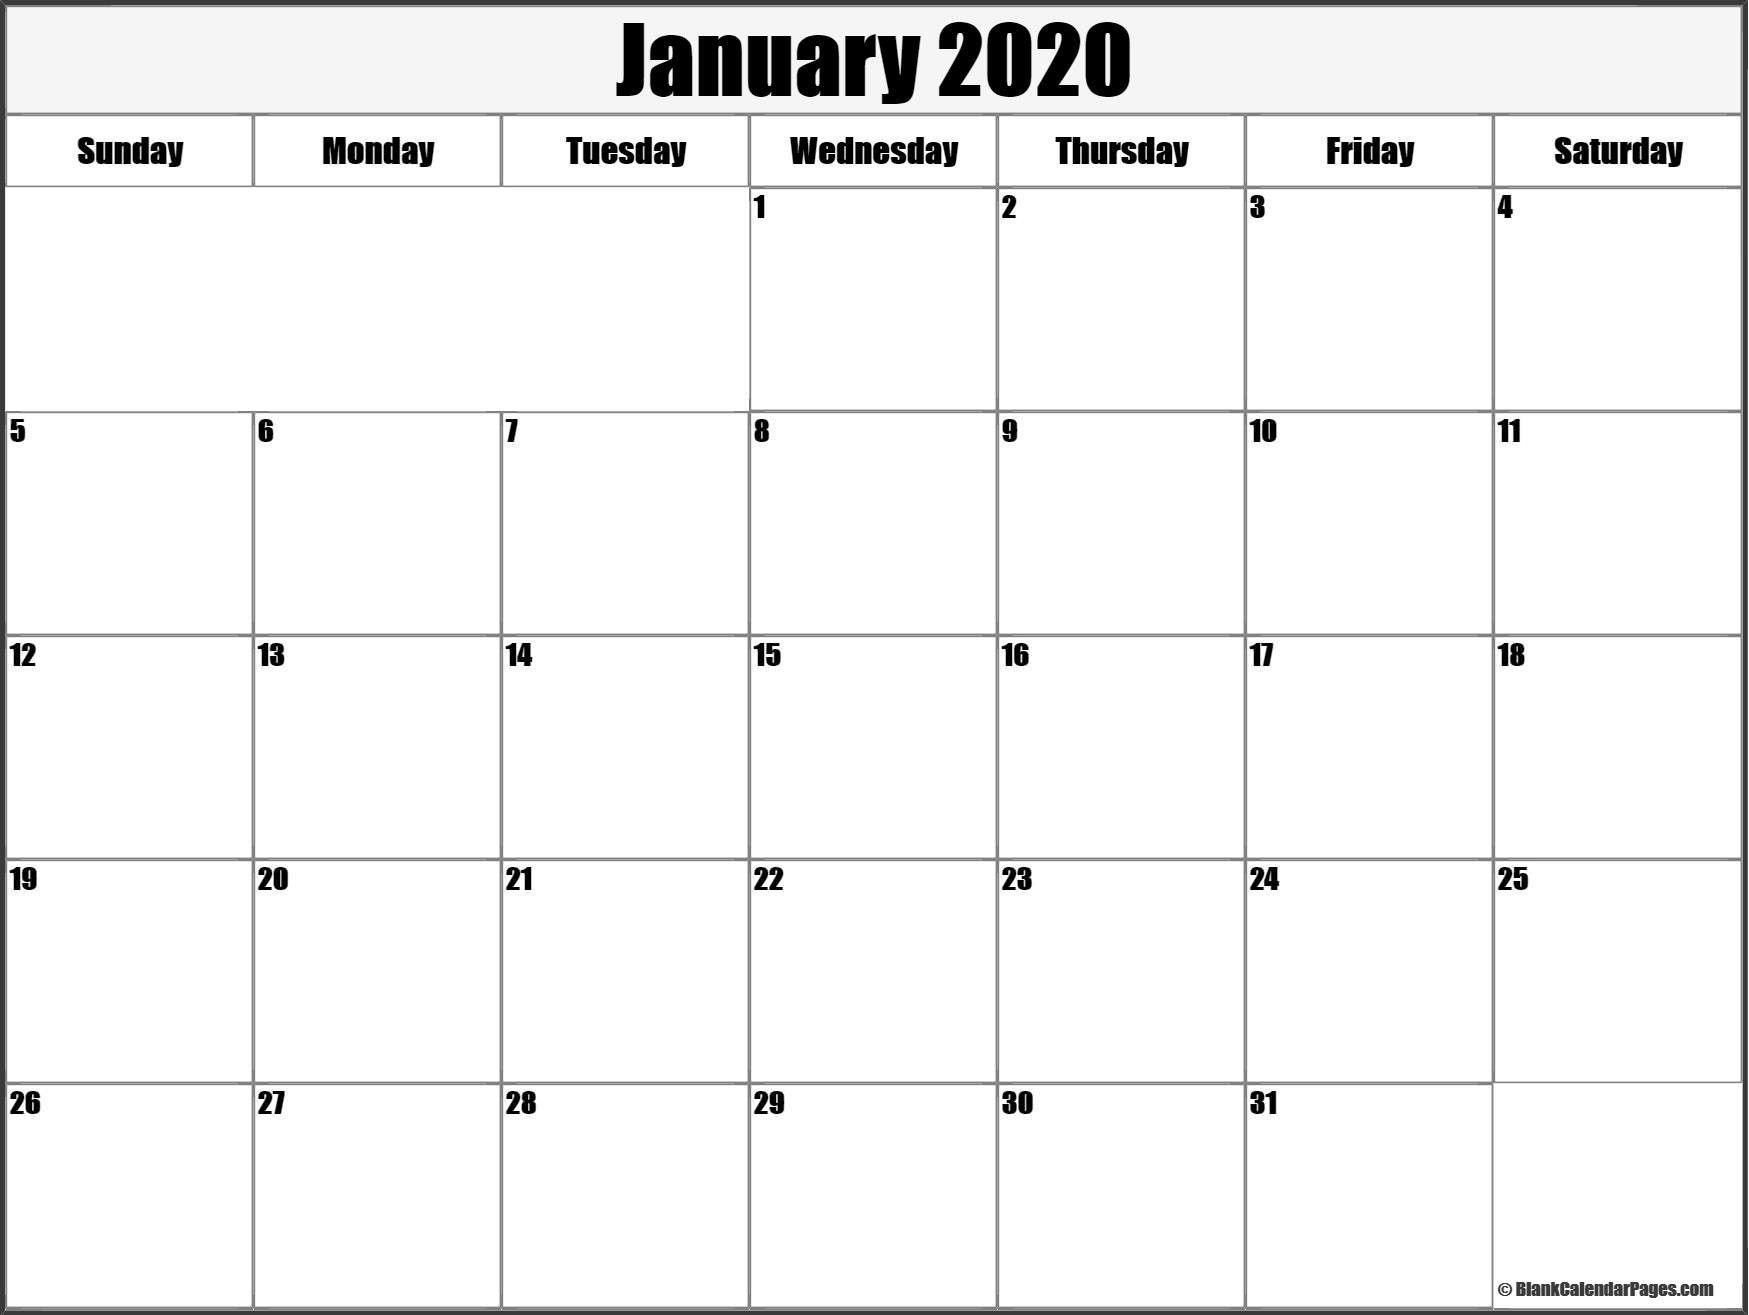 January 2020 Calendar Template #january #january2020-January 2020 Fillable Calendar